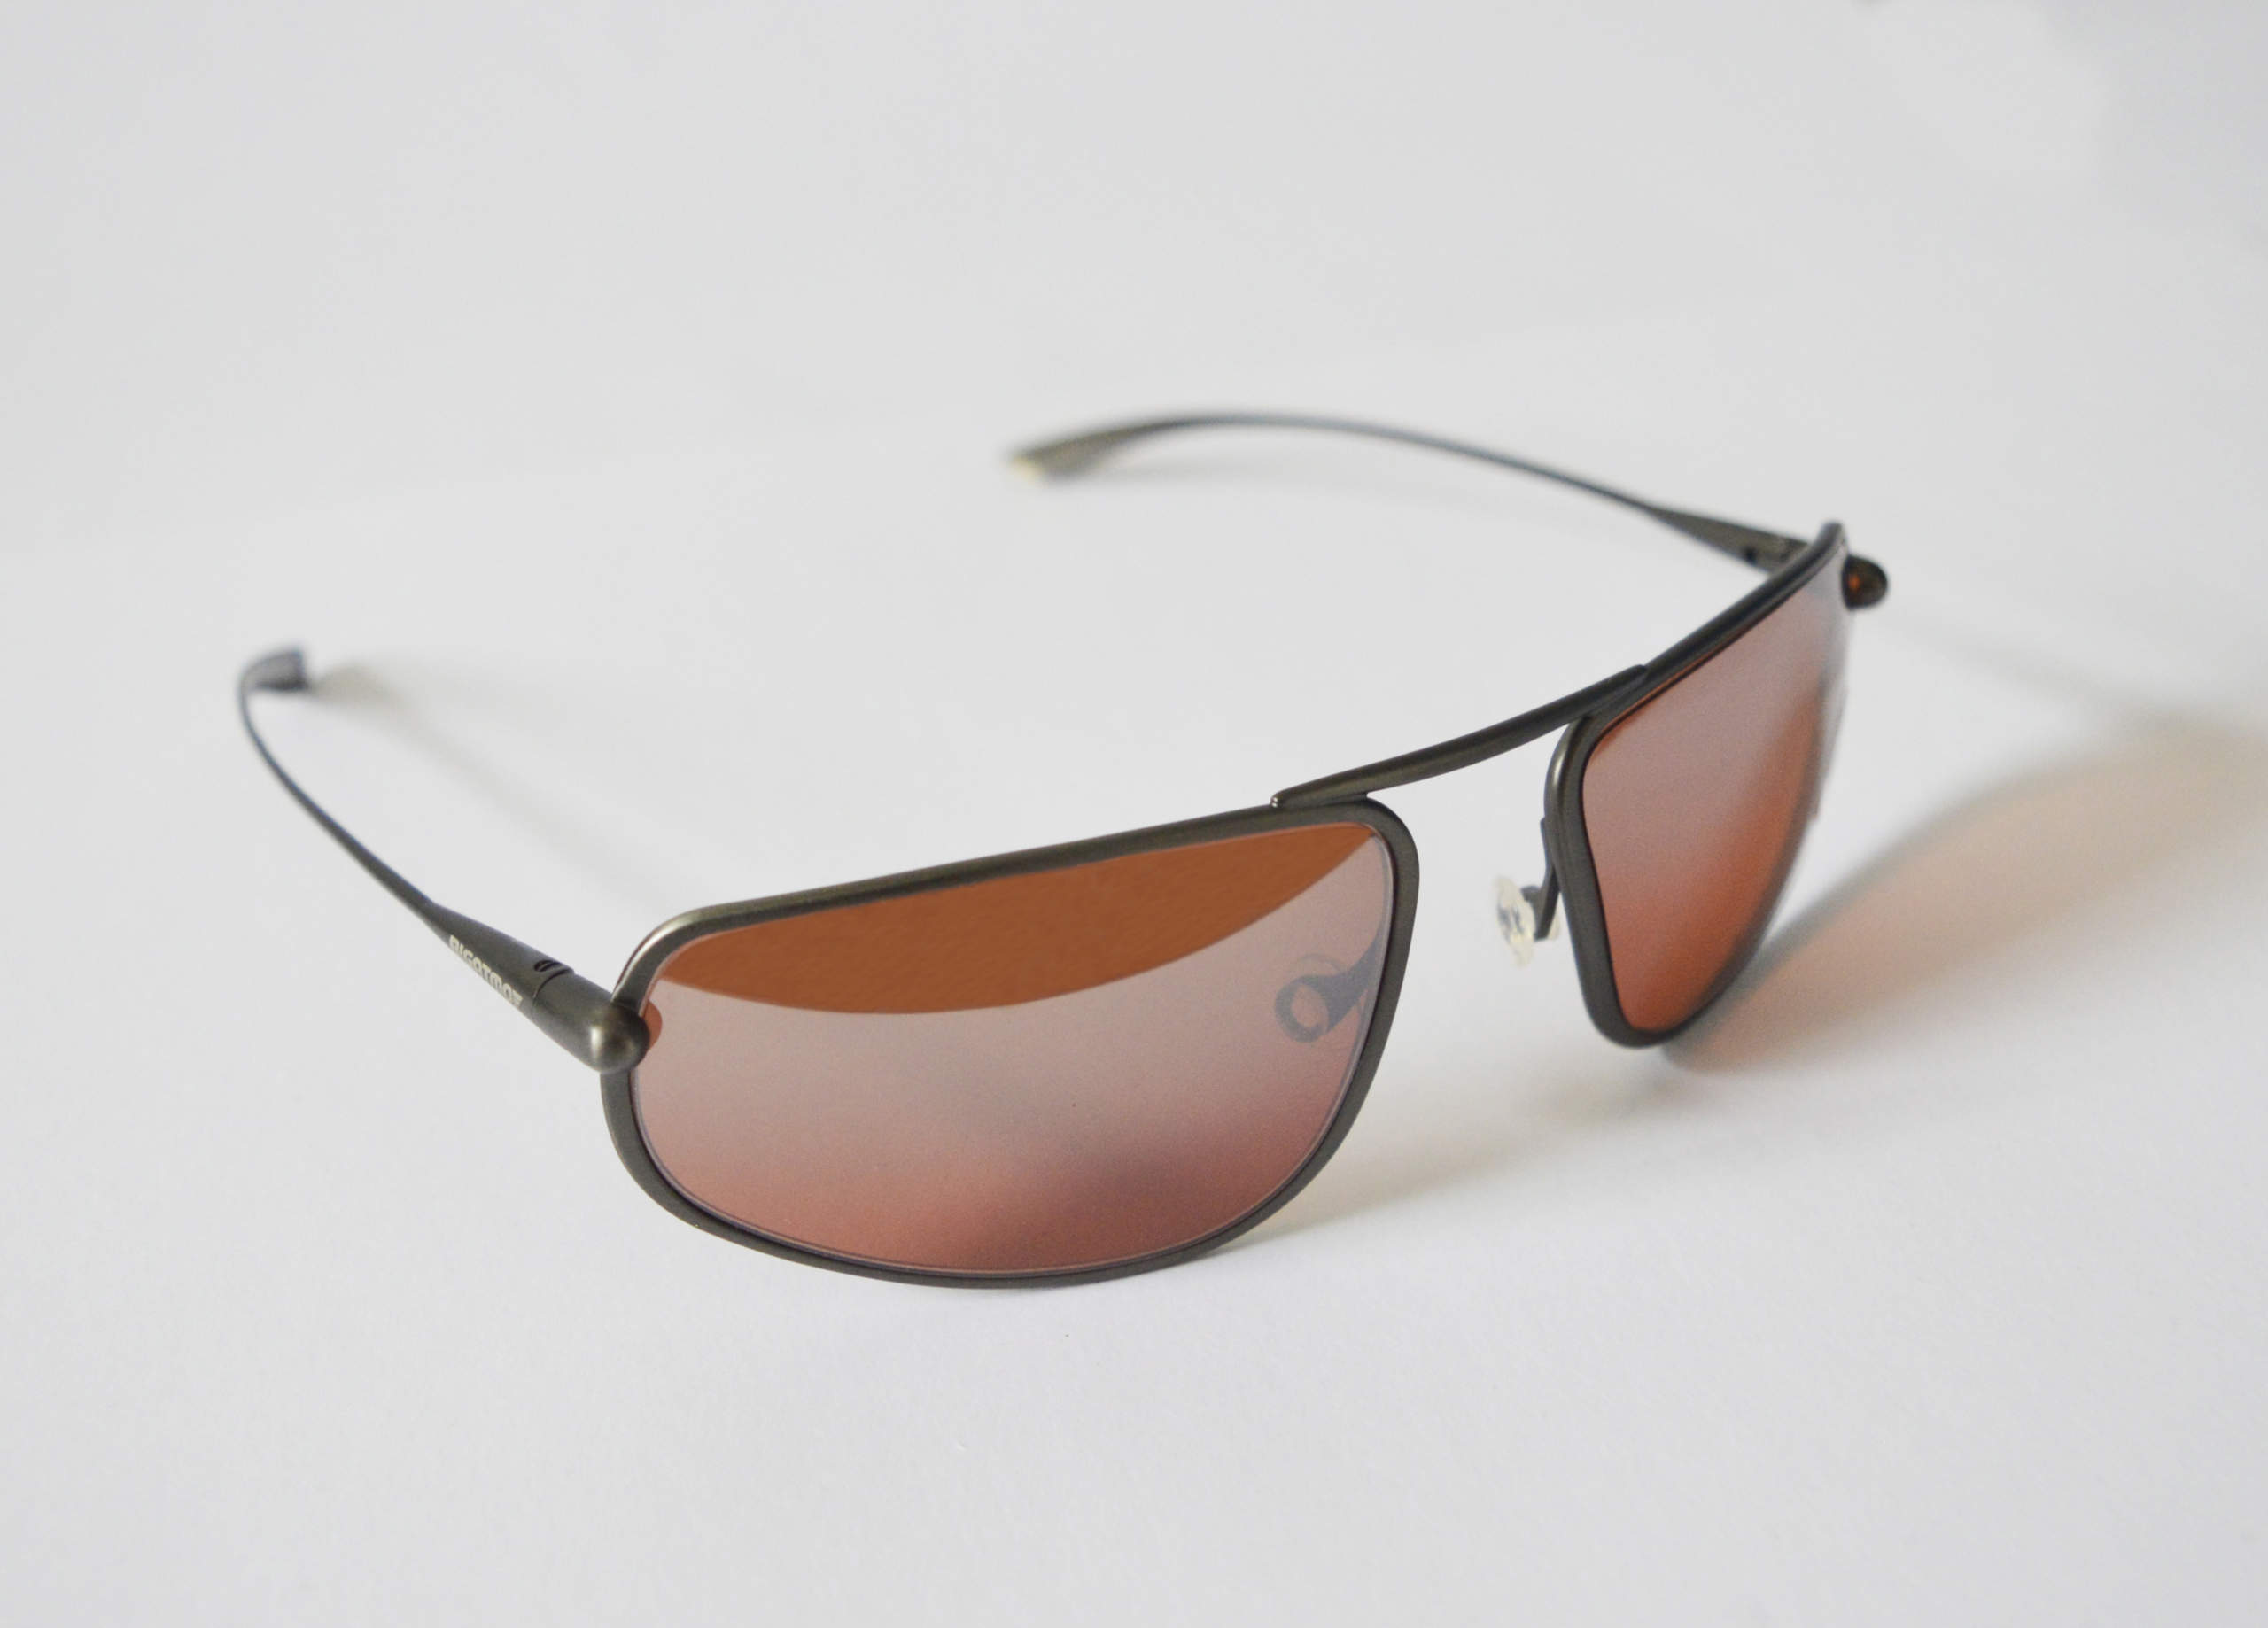 Strato - Gunmetal Titanium Frame Silver Gradient Mirror Copper/Brown Photochromic Sunglasses